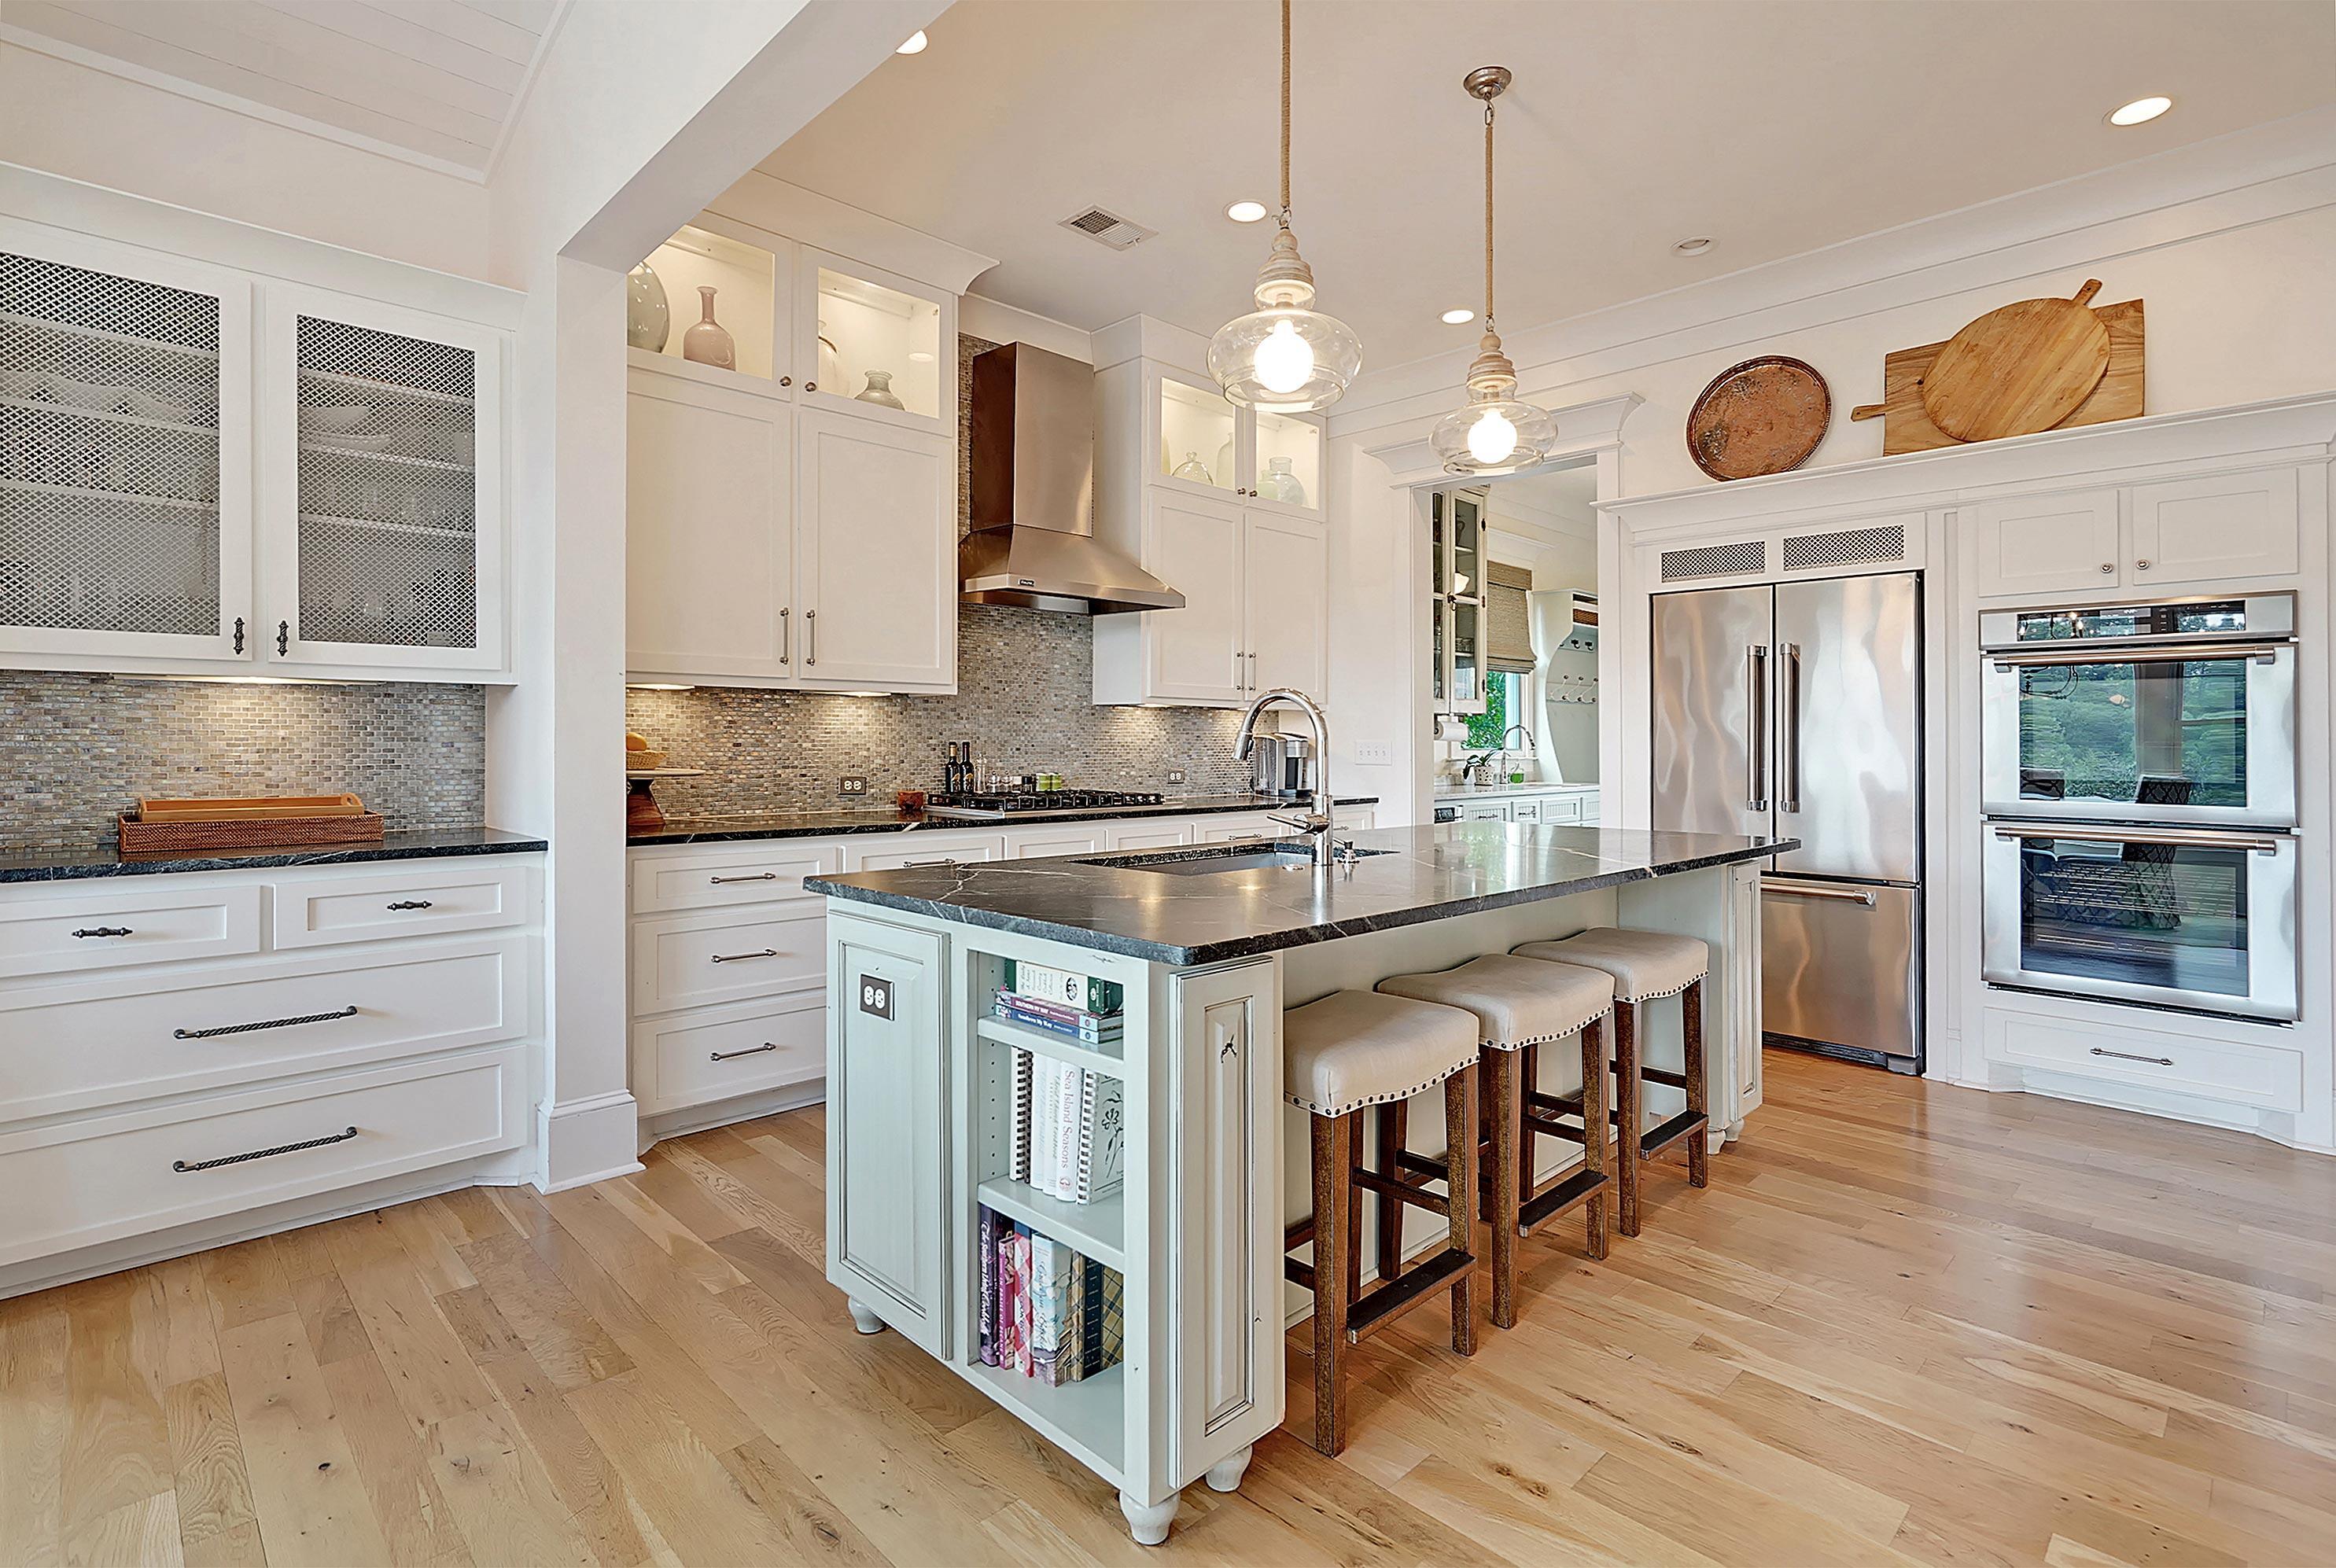 Grassy Creek Homes For Sale - 294 River Oak, Mount Pleasant, SC - 41